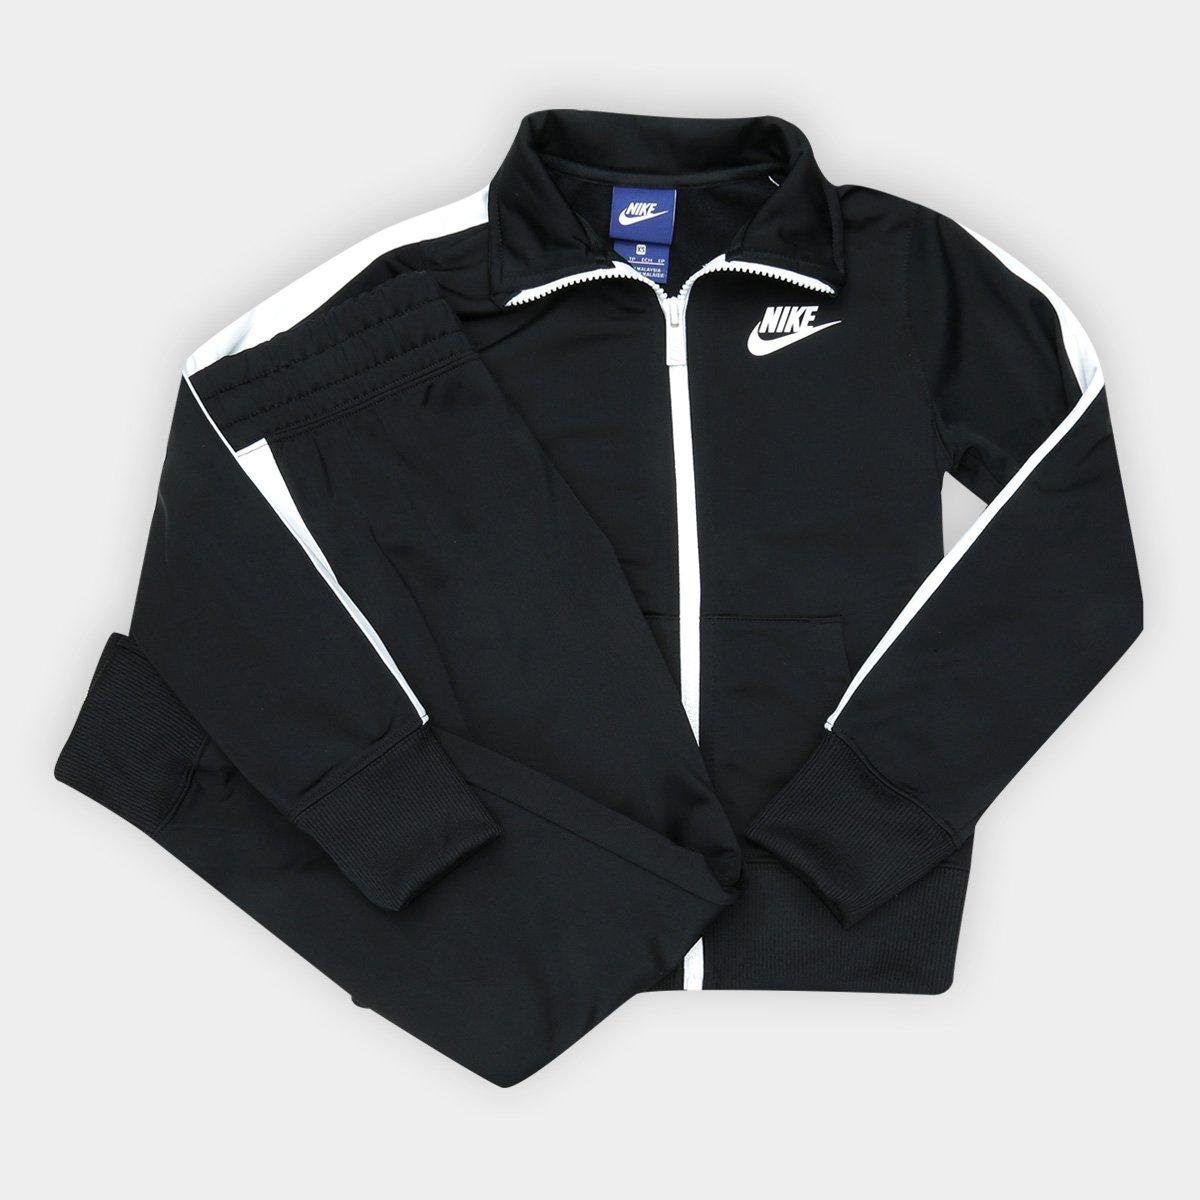 9c8baa82d1 FornecedorNetshoes. Agasalho Infantil Nike Sportswear Track Feminino